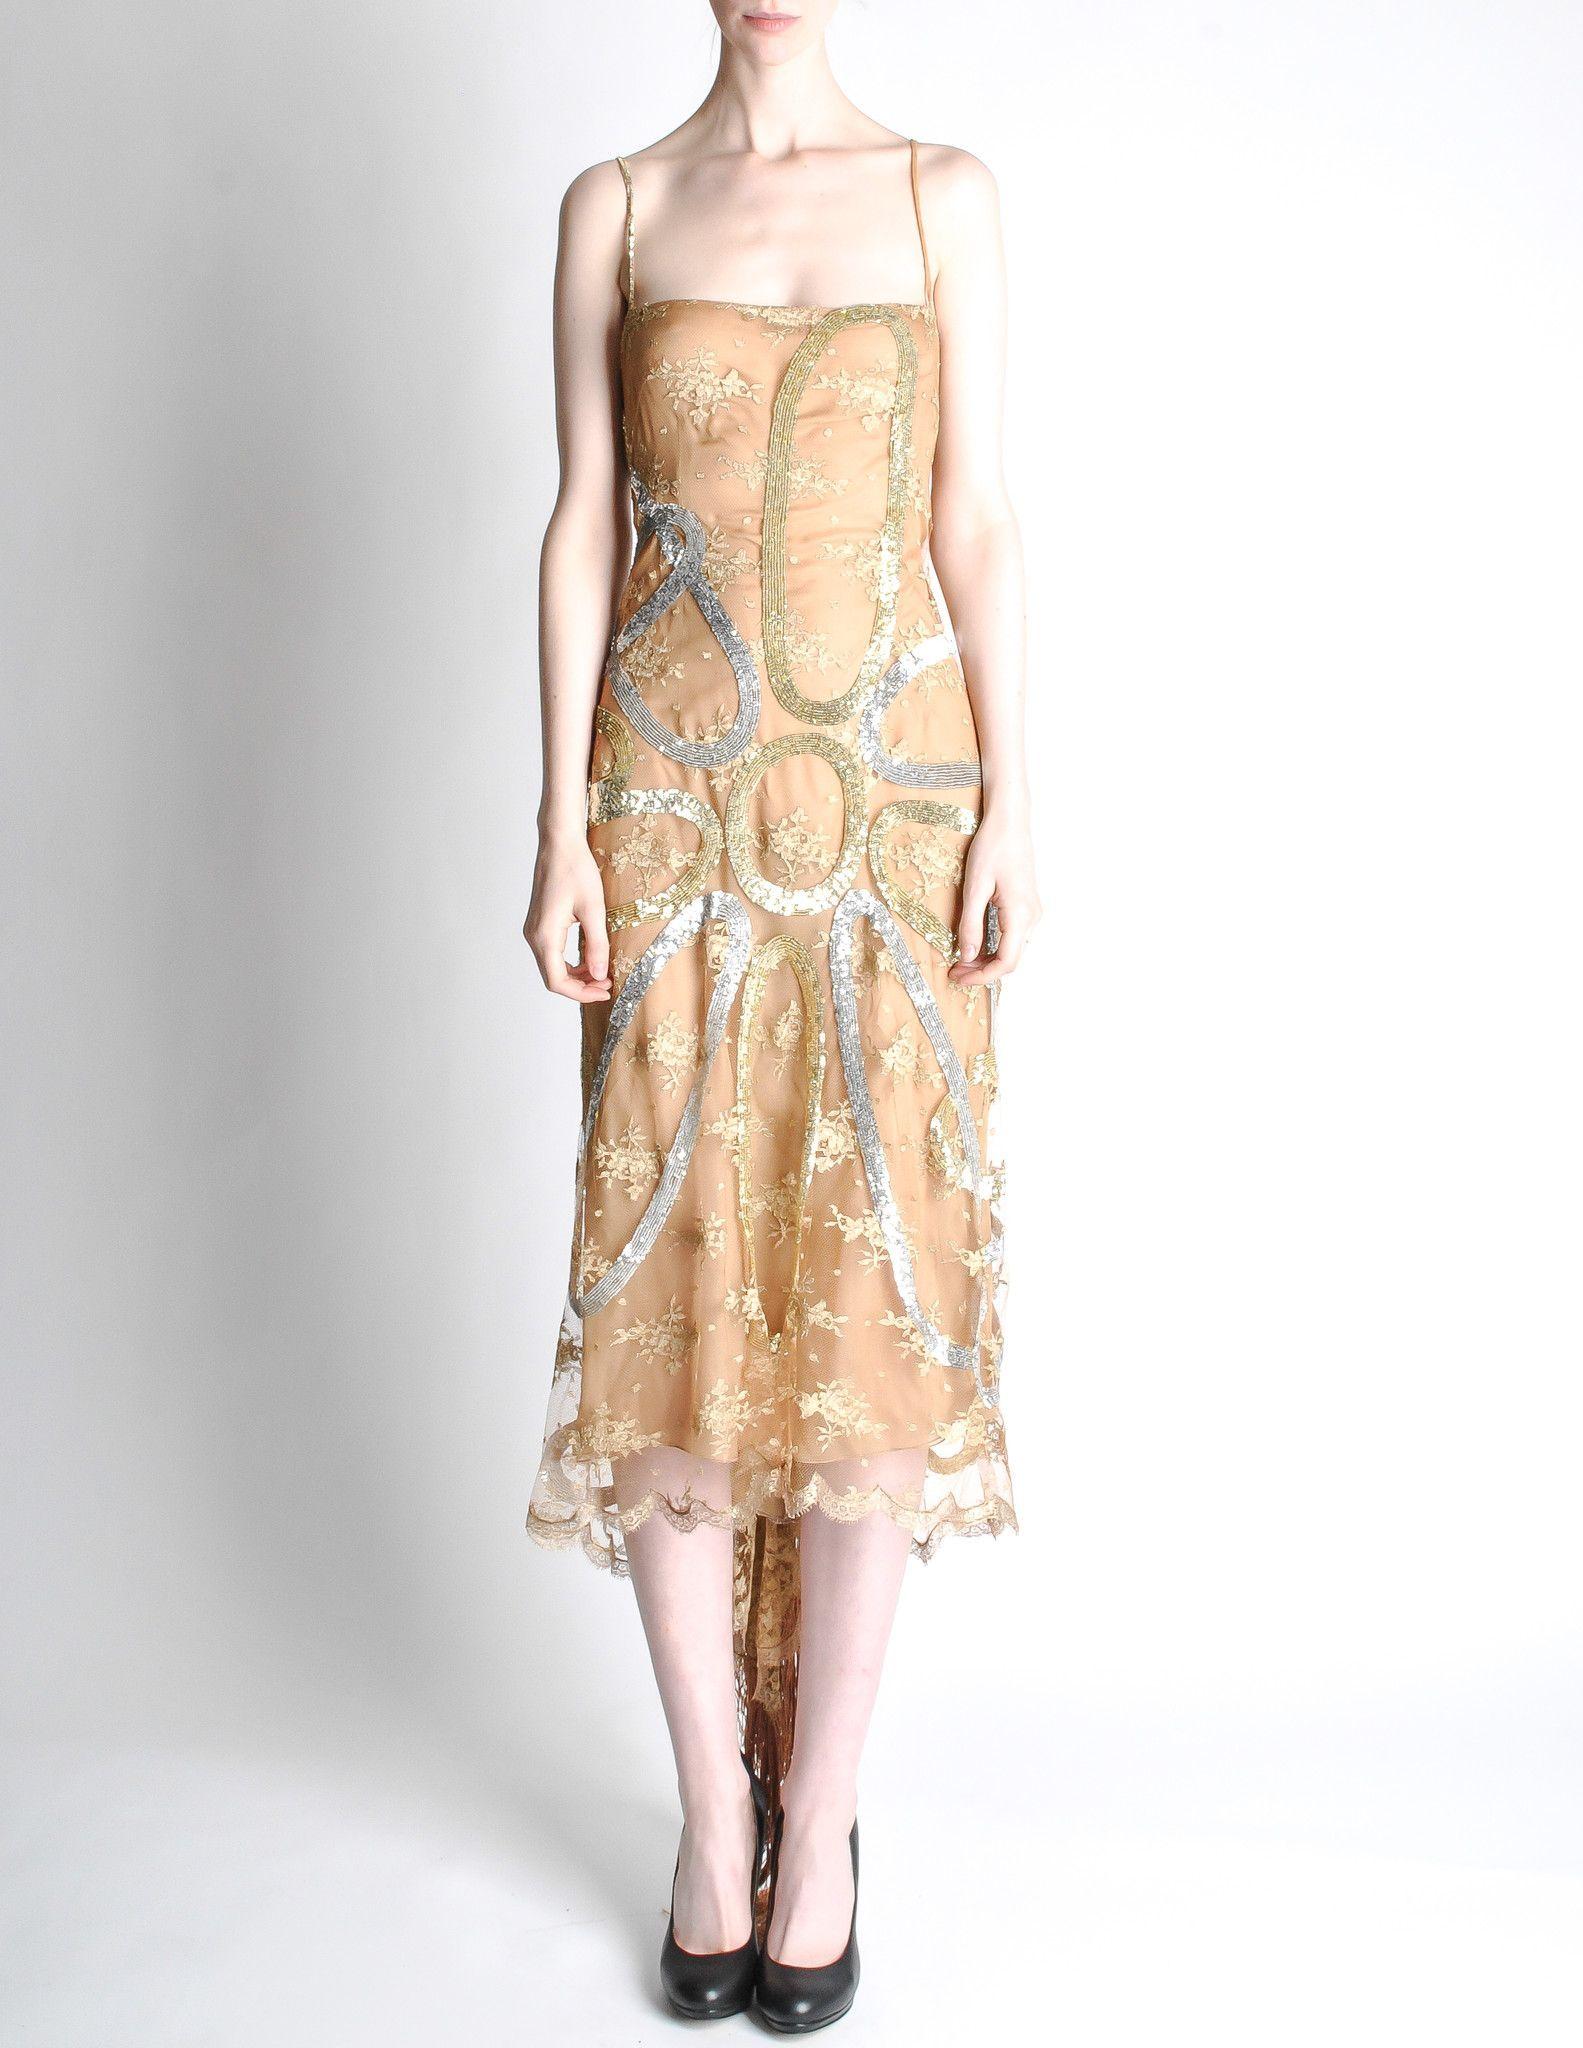 b1ccdbe2127 vintage valentino dresses - Google Search